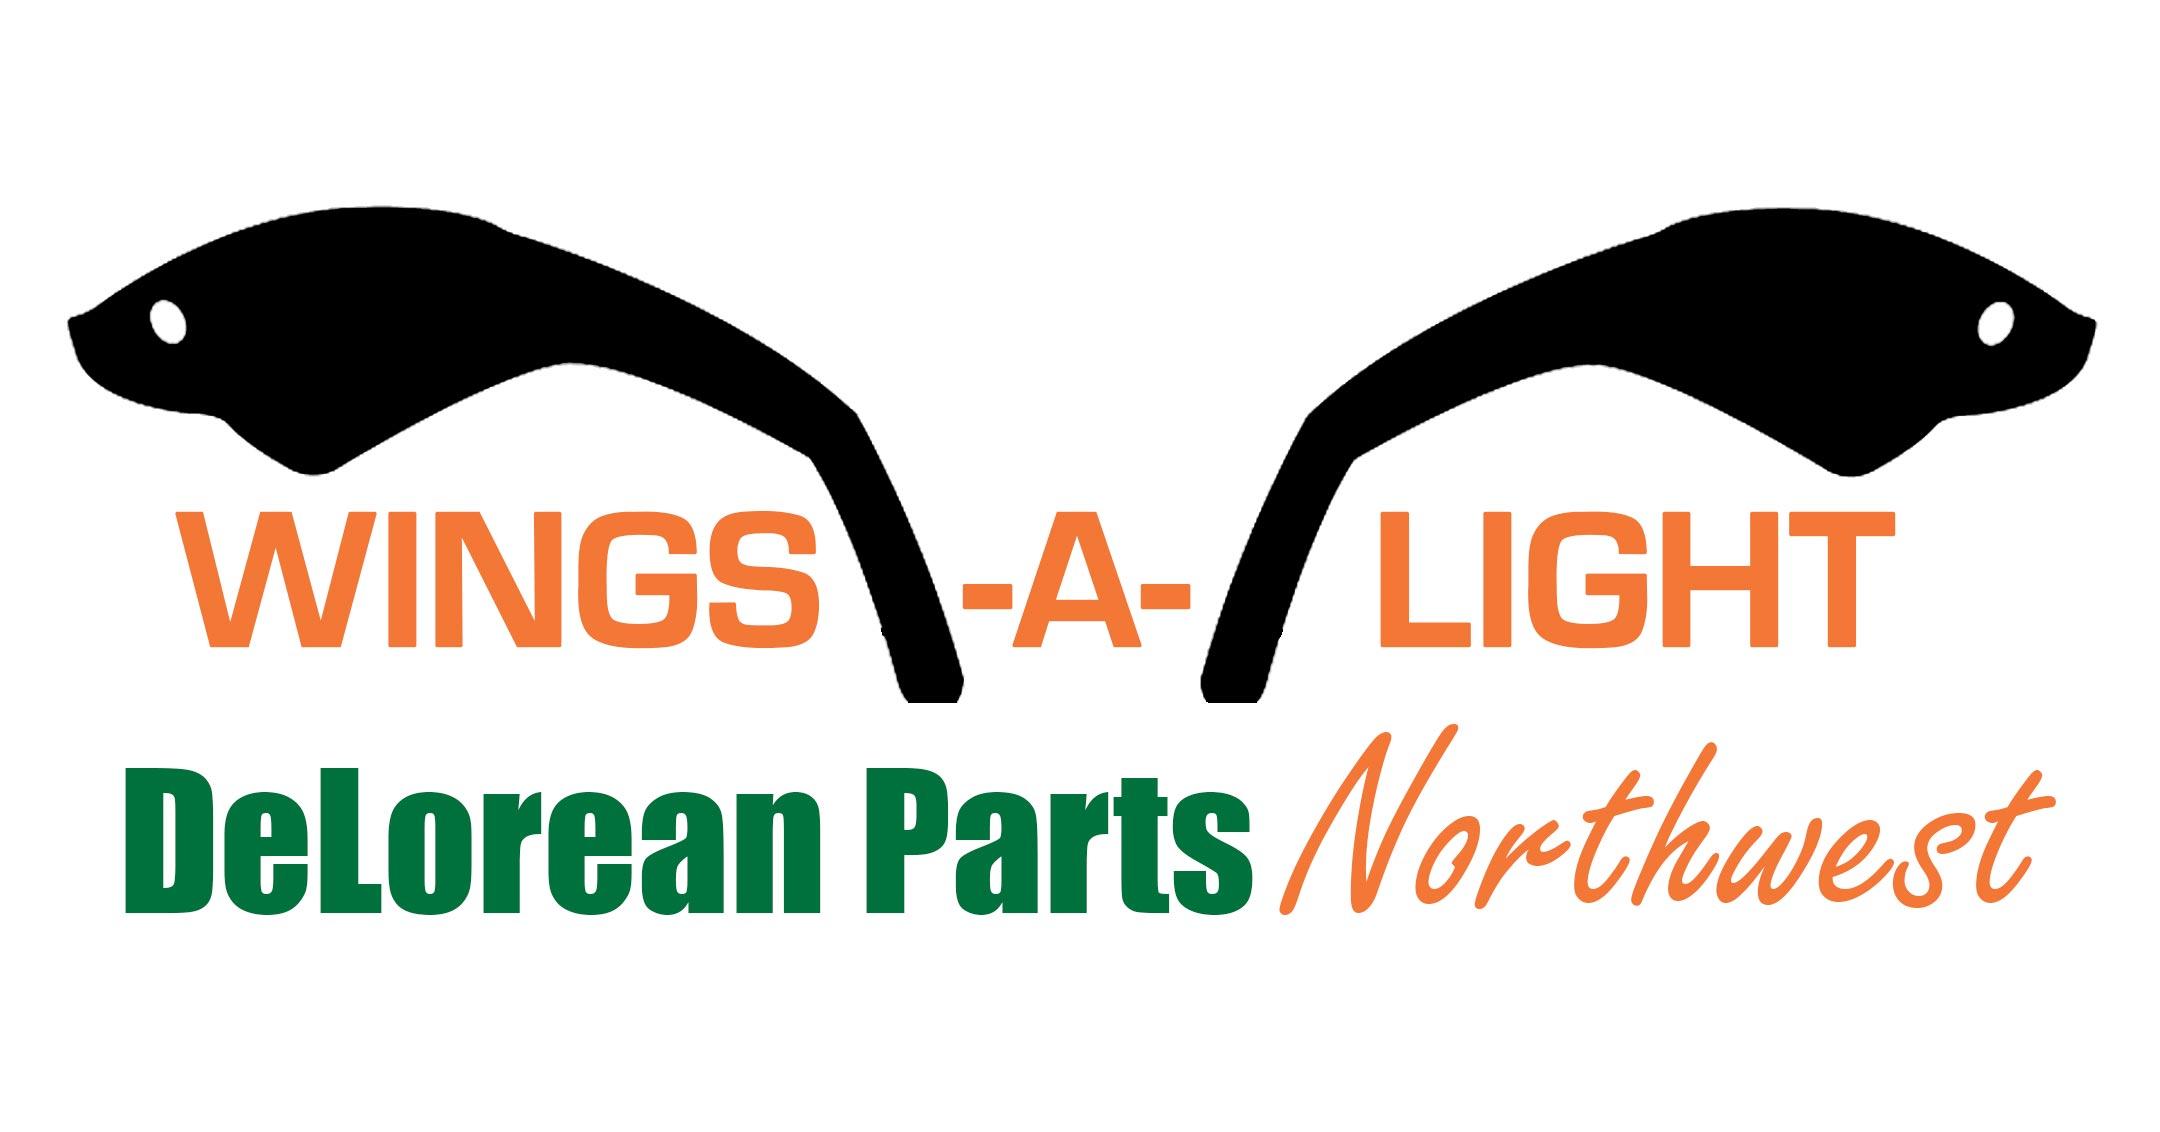 Wings-A-Light | DeLorean Parts Northwest